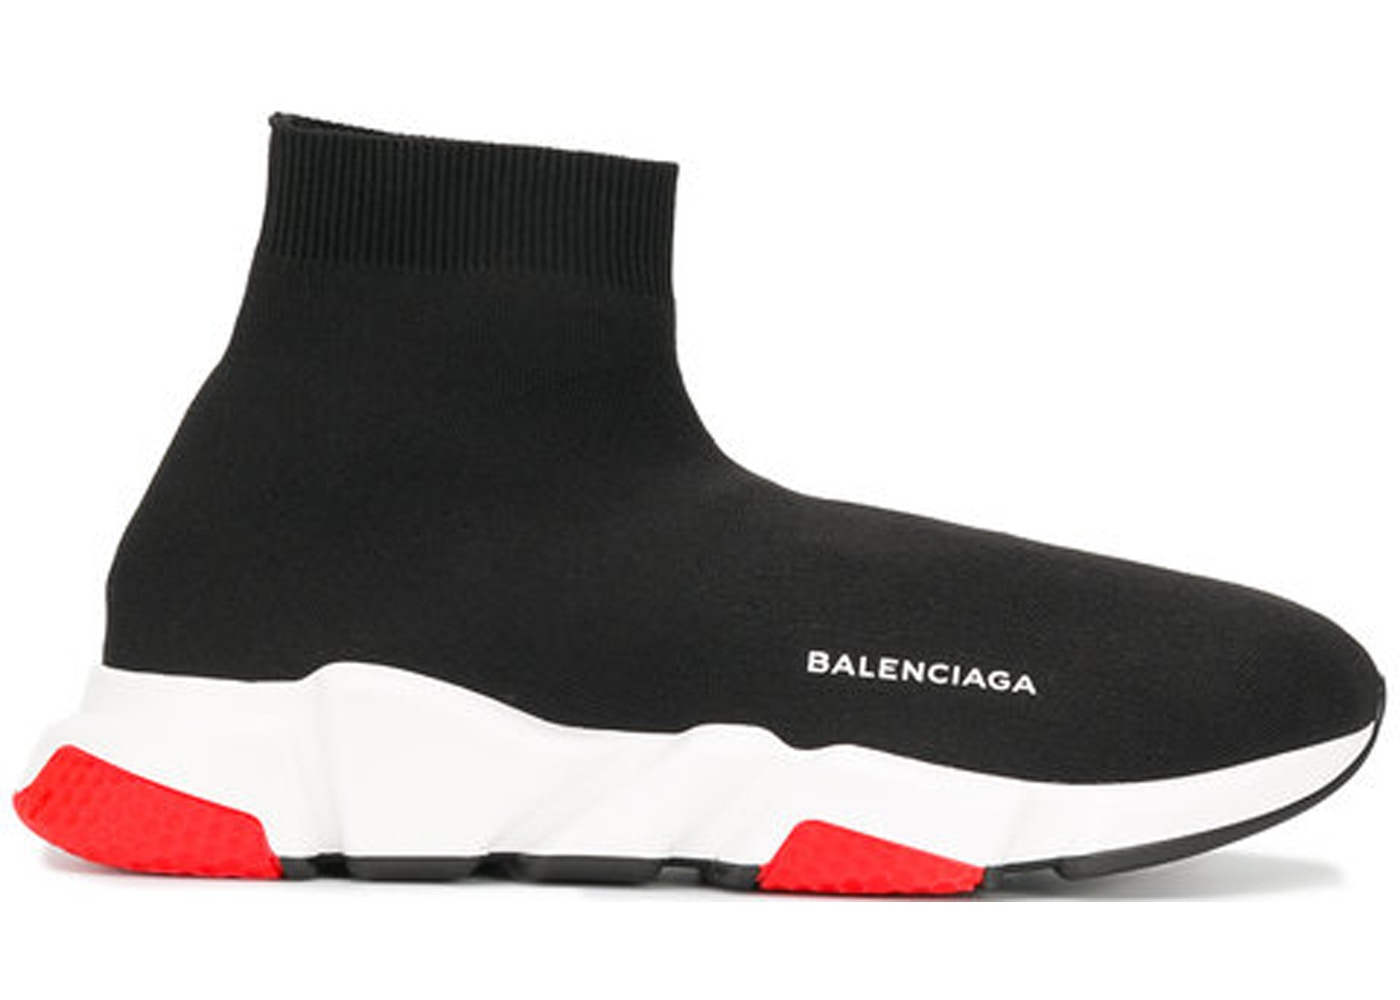 7fd5c8150d Balenciaga Speed Trainer Black Red - 530351 W05G0 1000